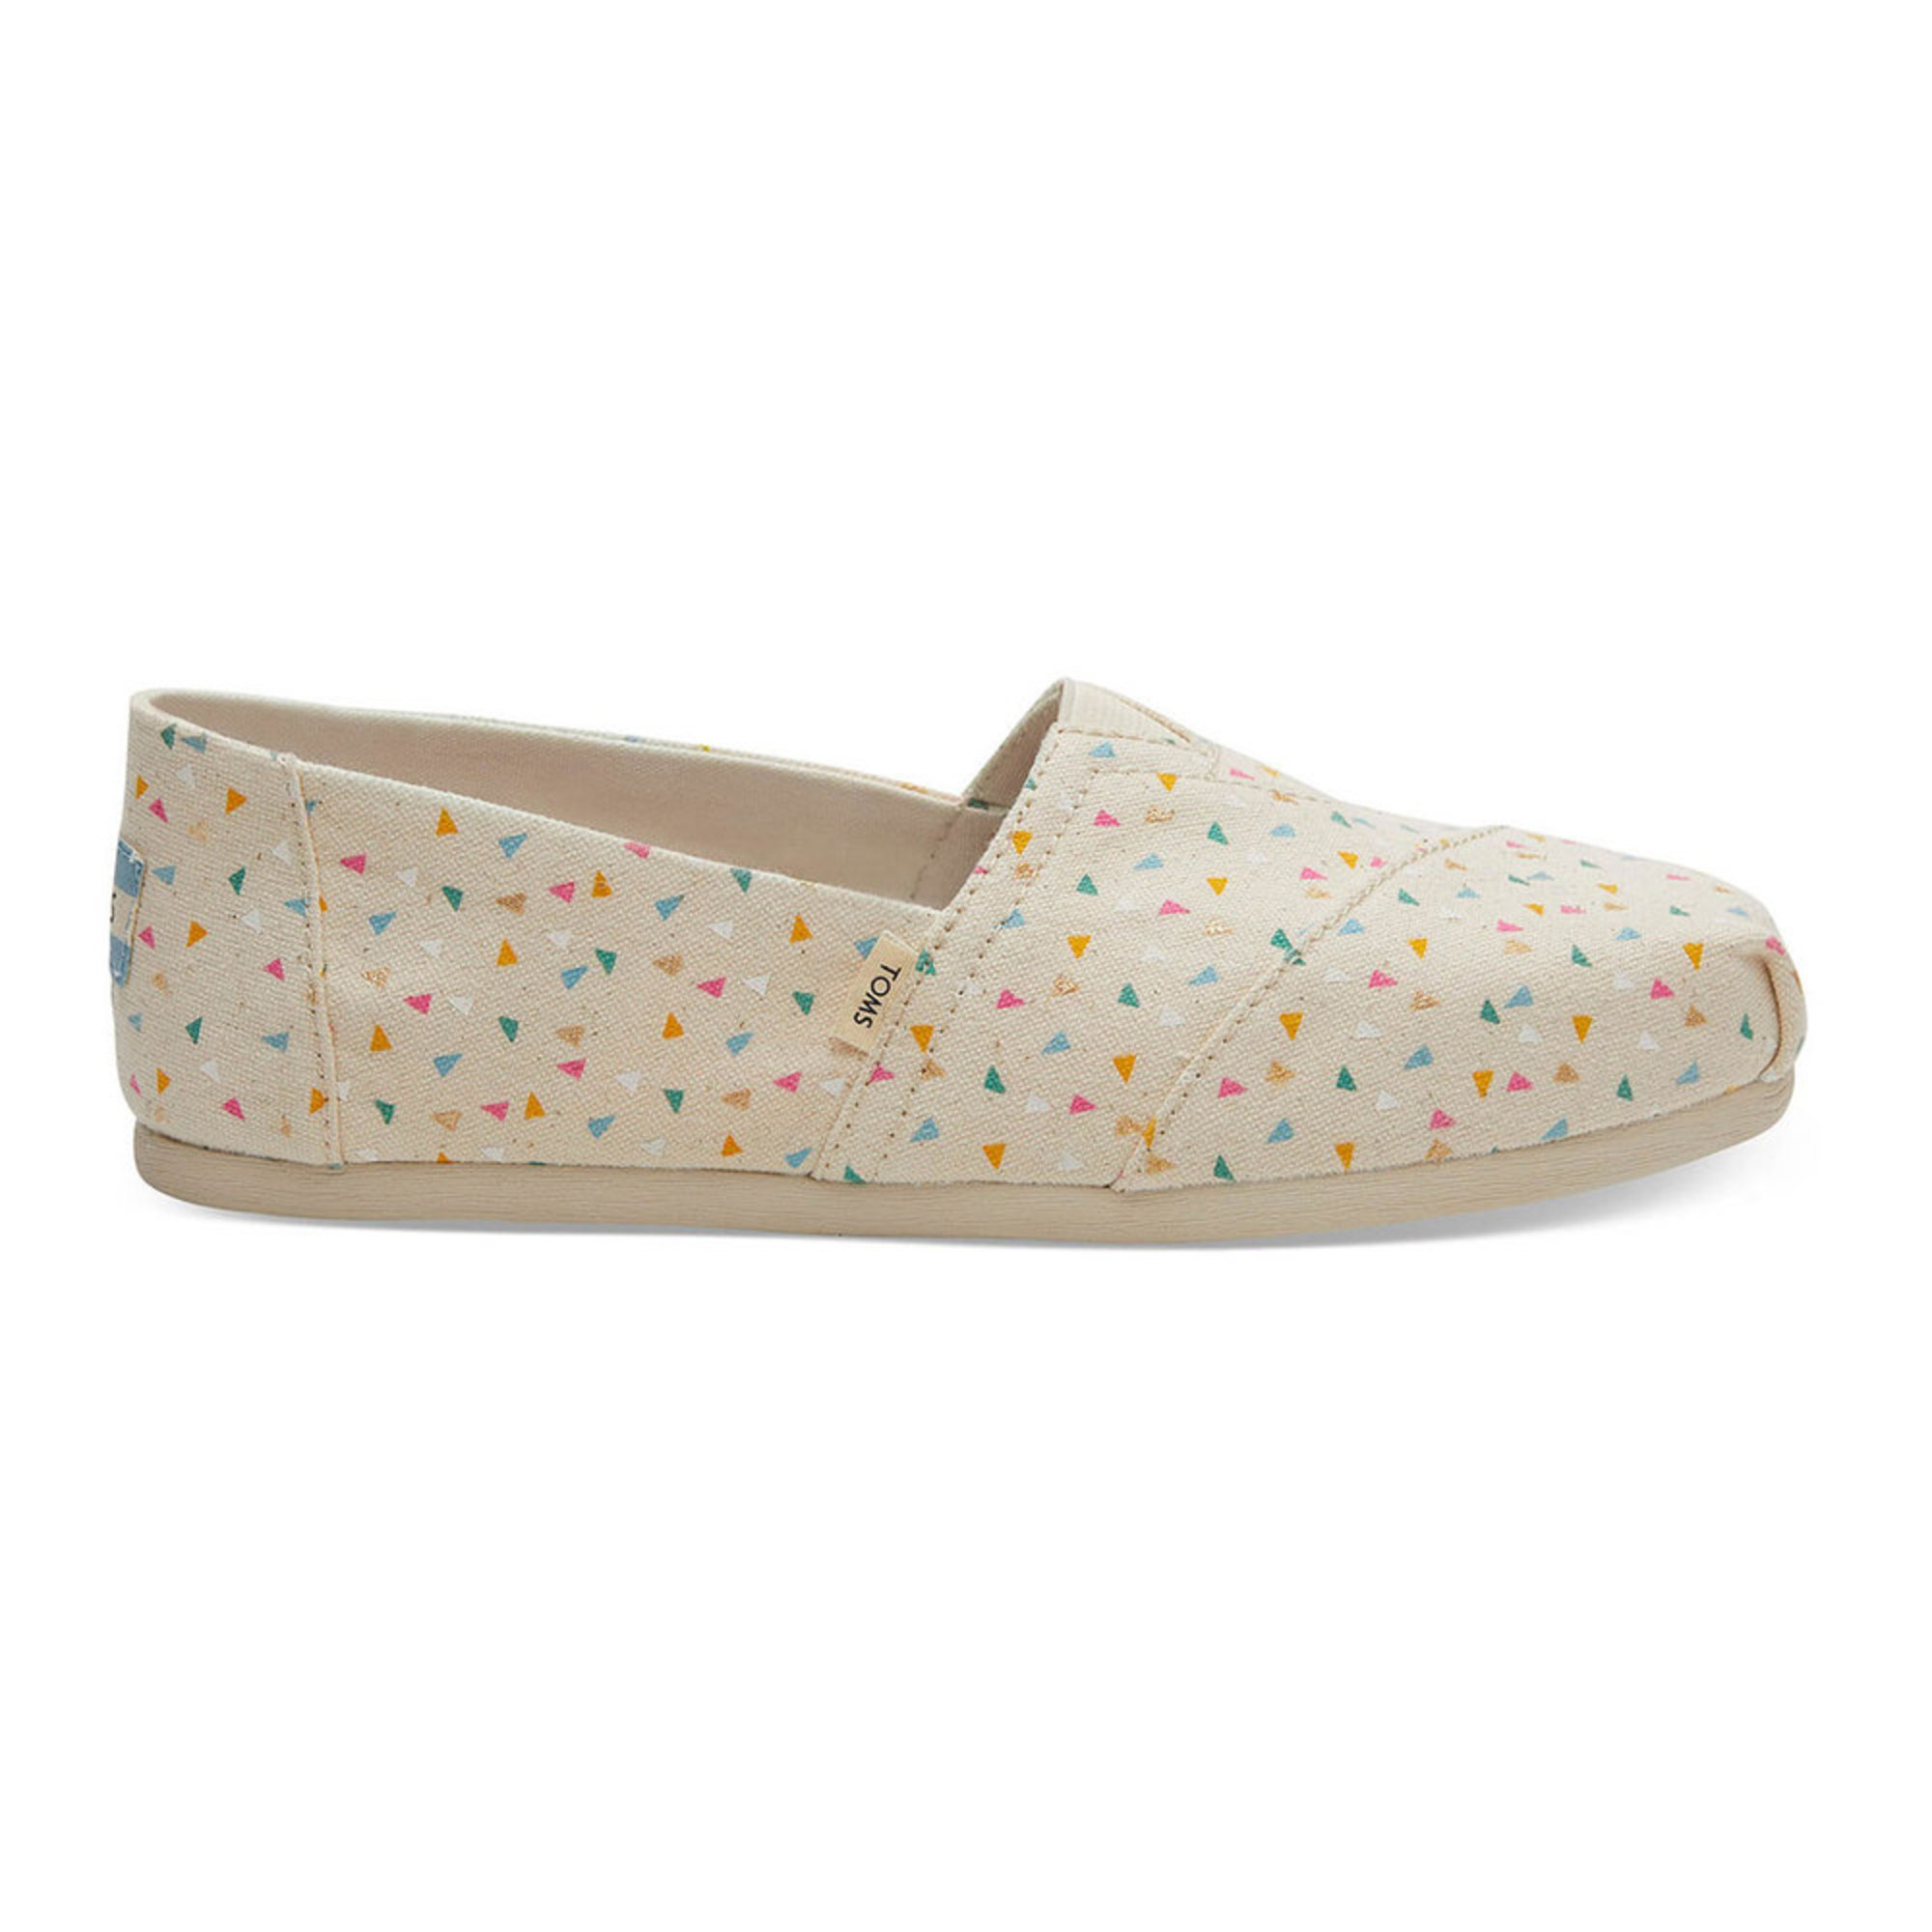 2294e0463be4 Toms Women's Alpargata Slip On Shoe | Women's Slip On Shoes | Shoes ...